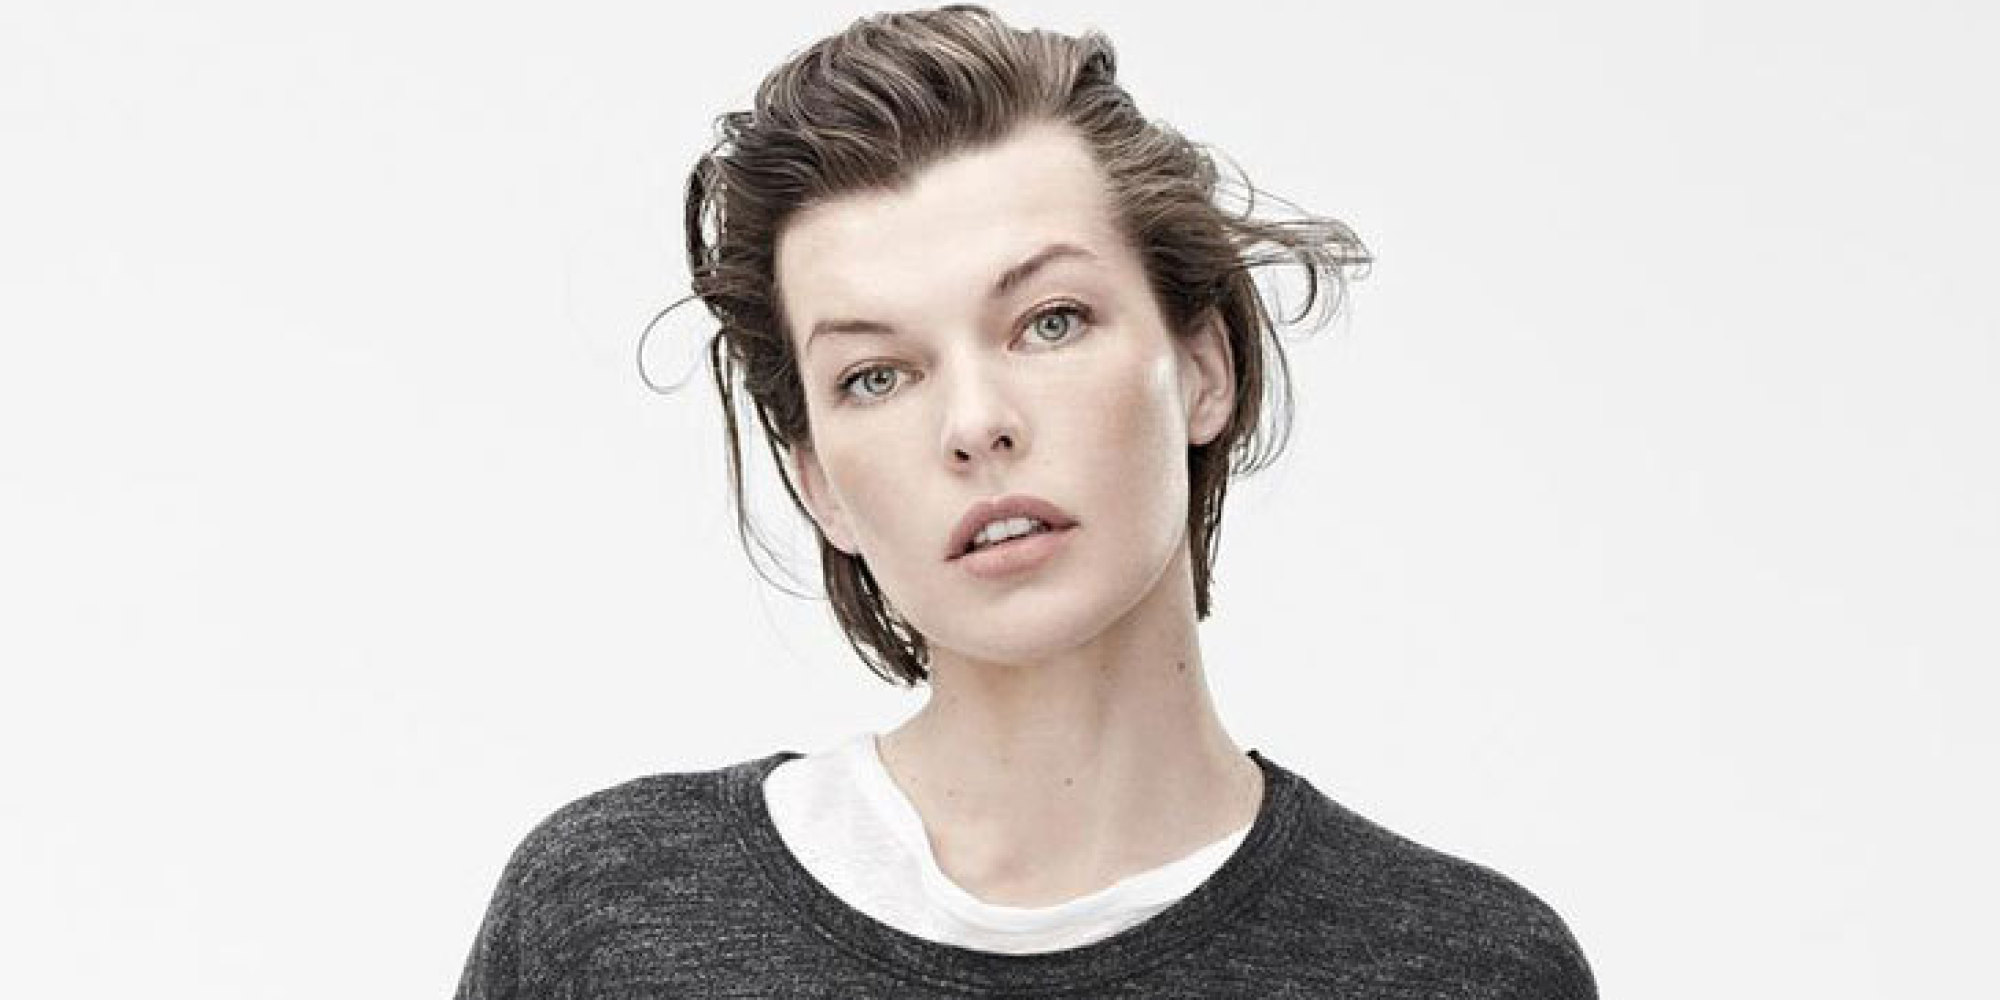 Milla Jovovich gets a name change